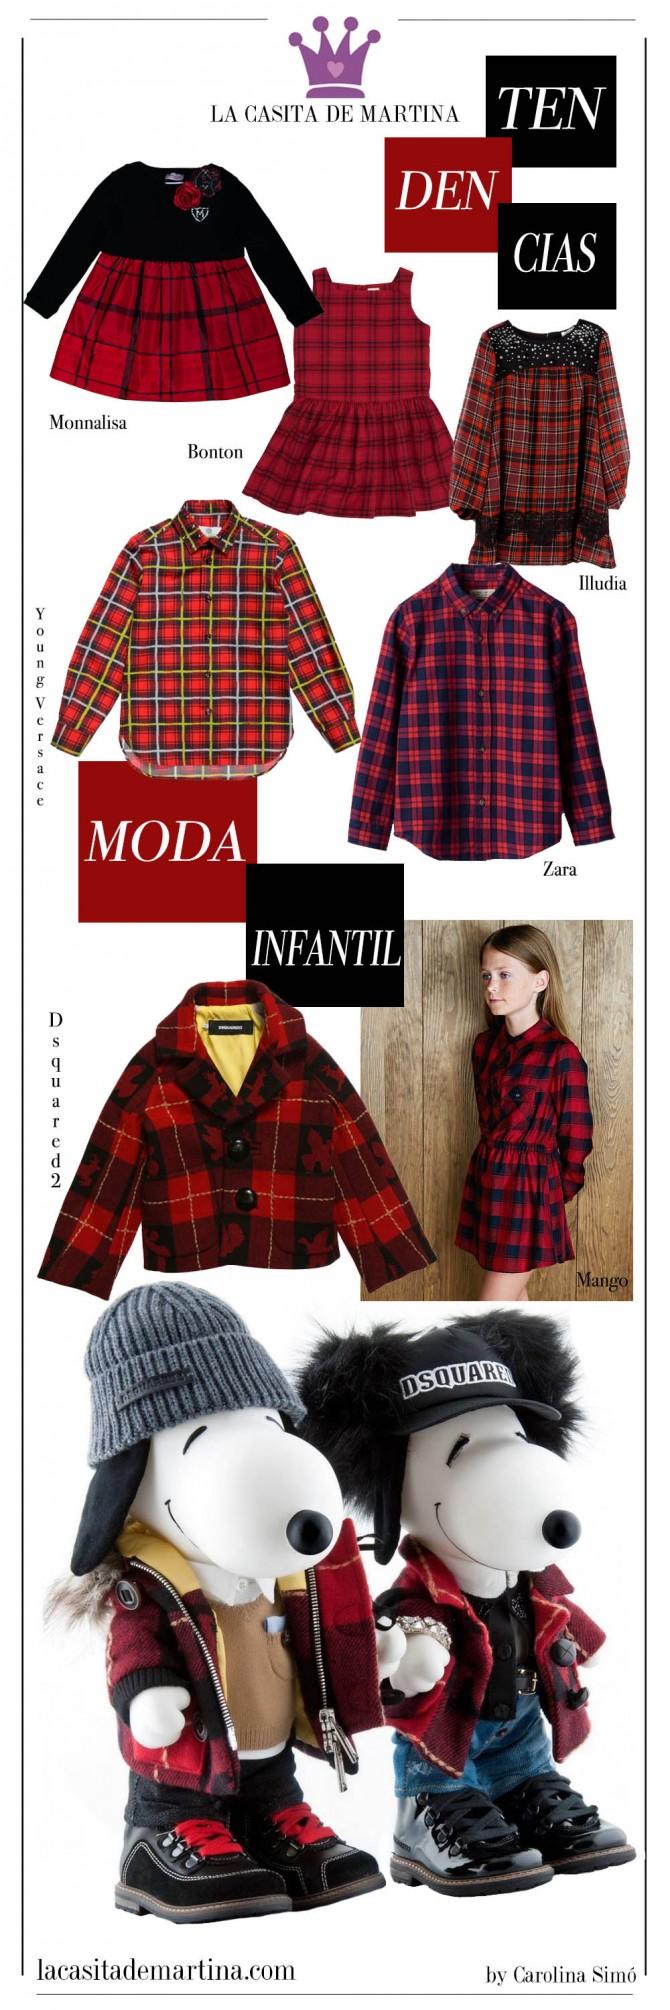 Tendencias Moda Infantil, Zara Kids, Bonton, H&M, Blog Moda Infantil, La casita de Martina